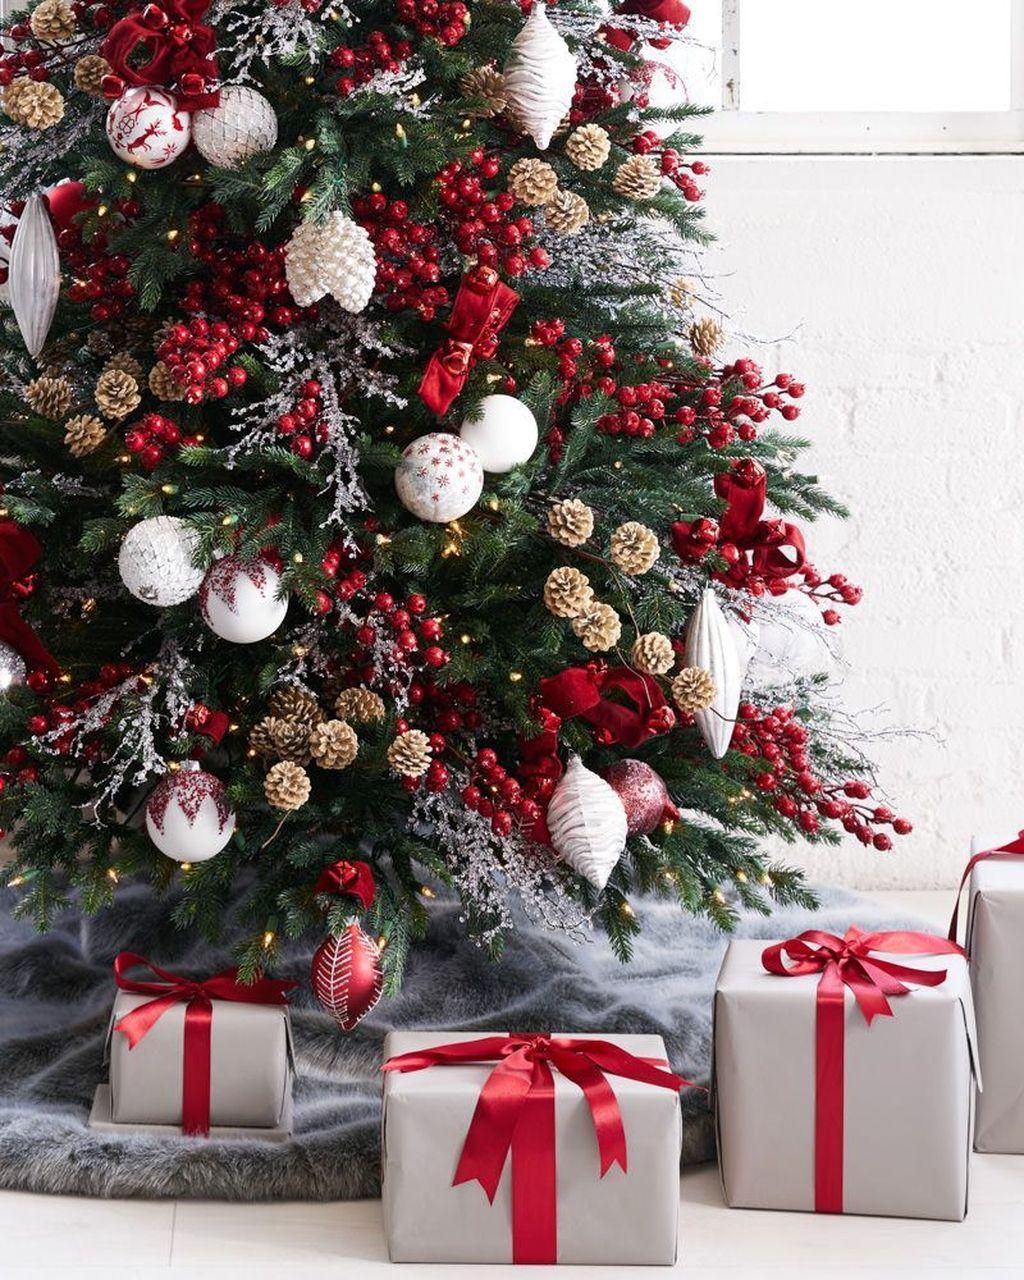 Amazing Winter Christmas Tree Design And Decor Ideas 10